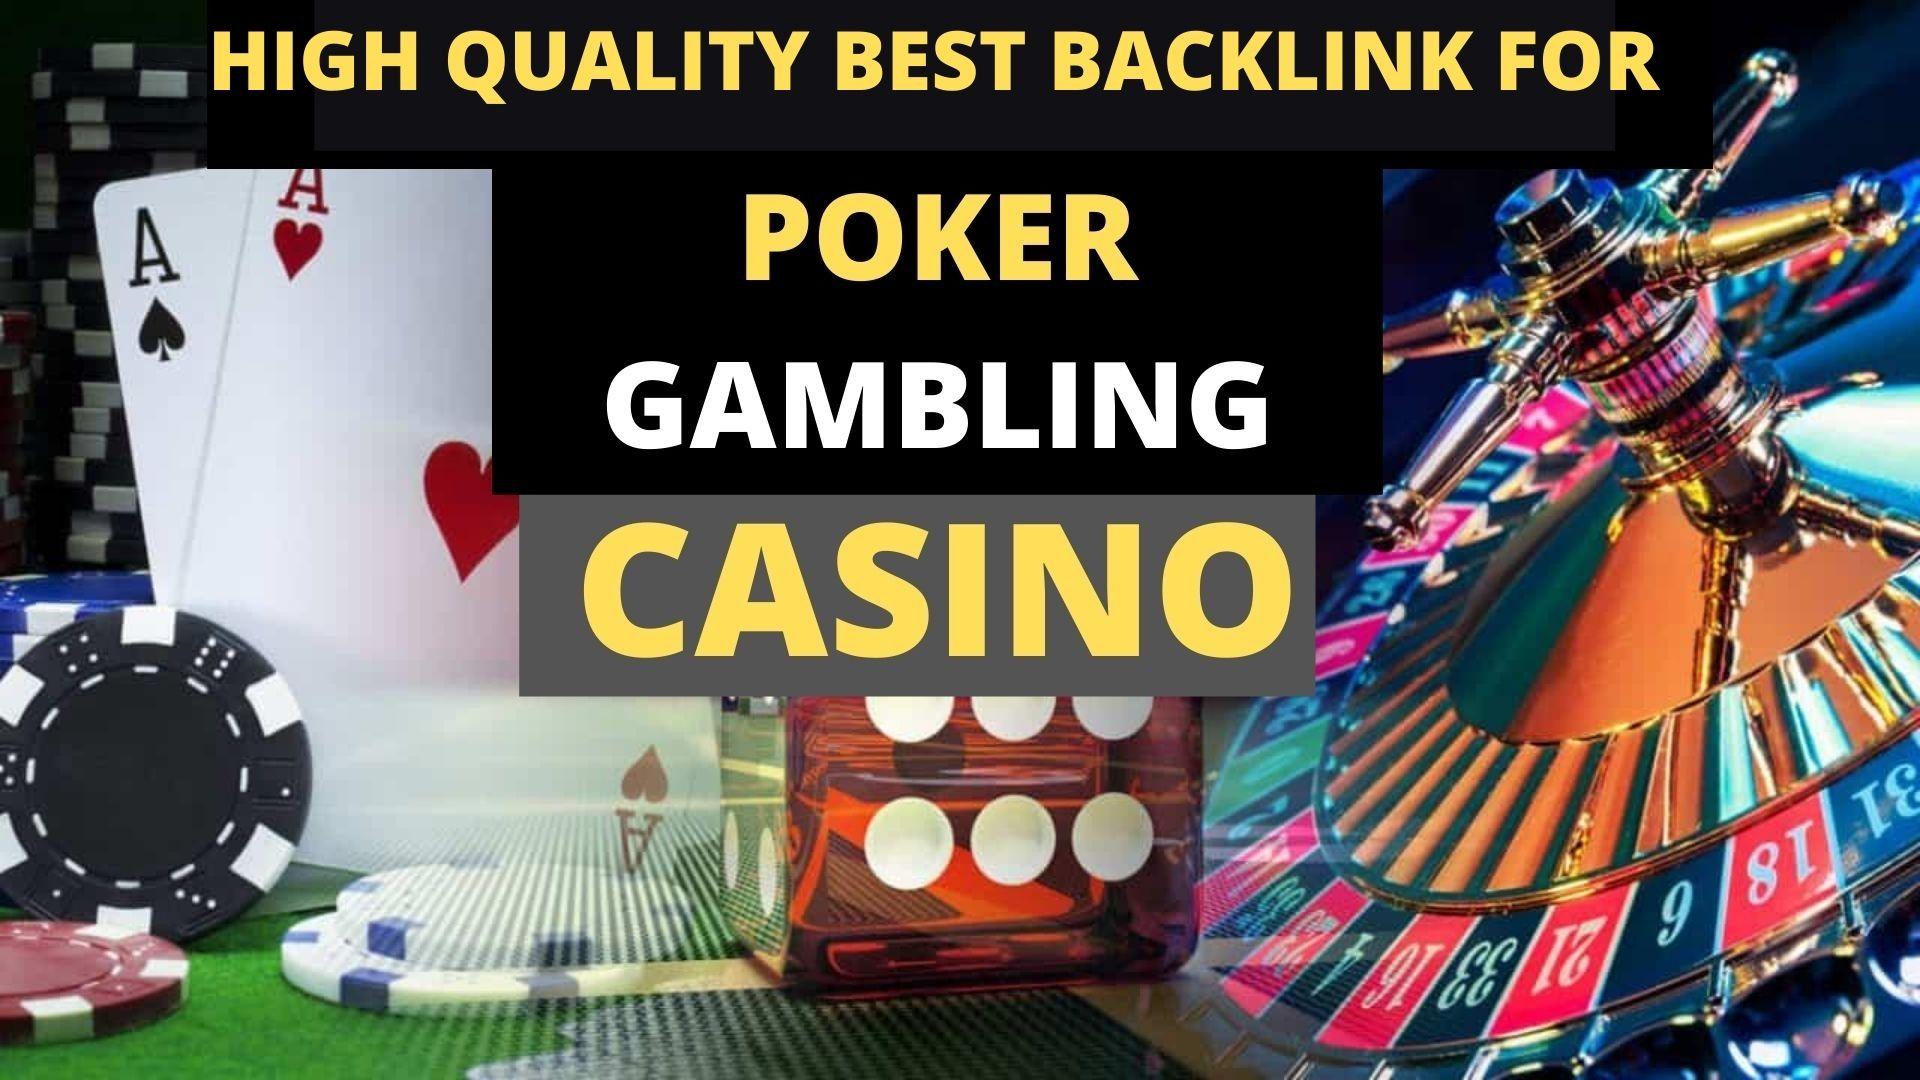 100 PBN Super-strong Homepage PBNs for gambling,  Casino,  Poker,  Judi Bola - SEO services